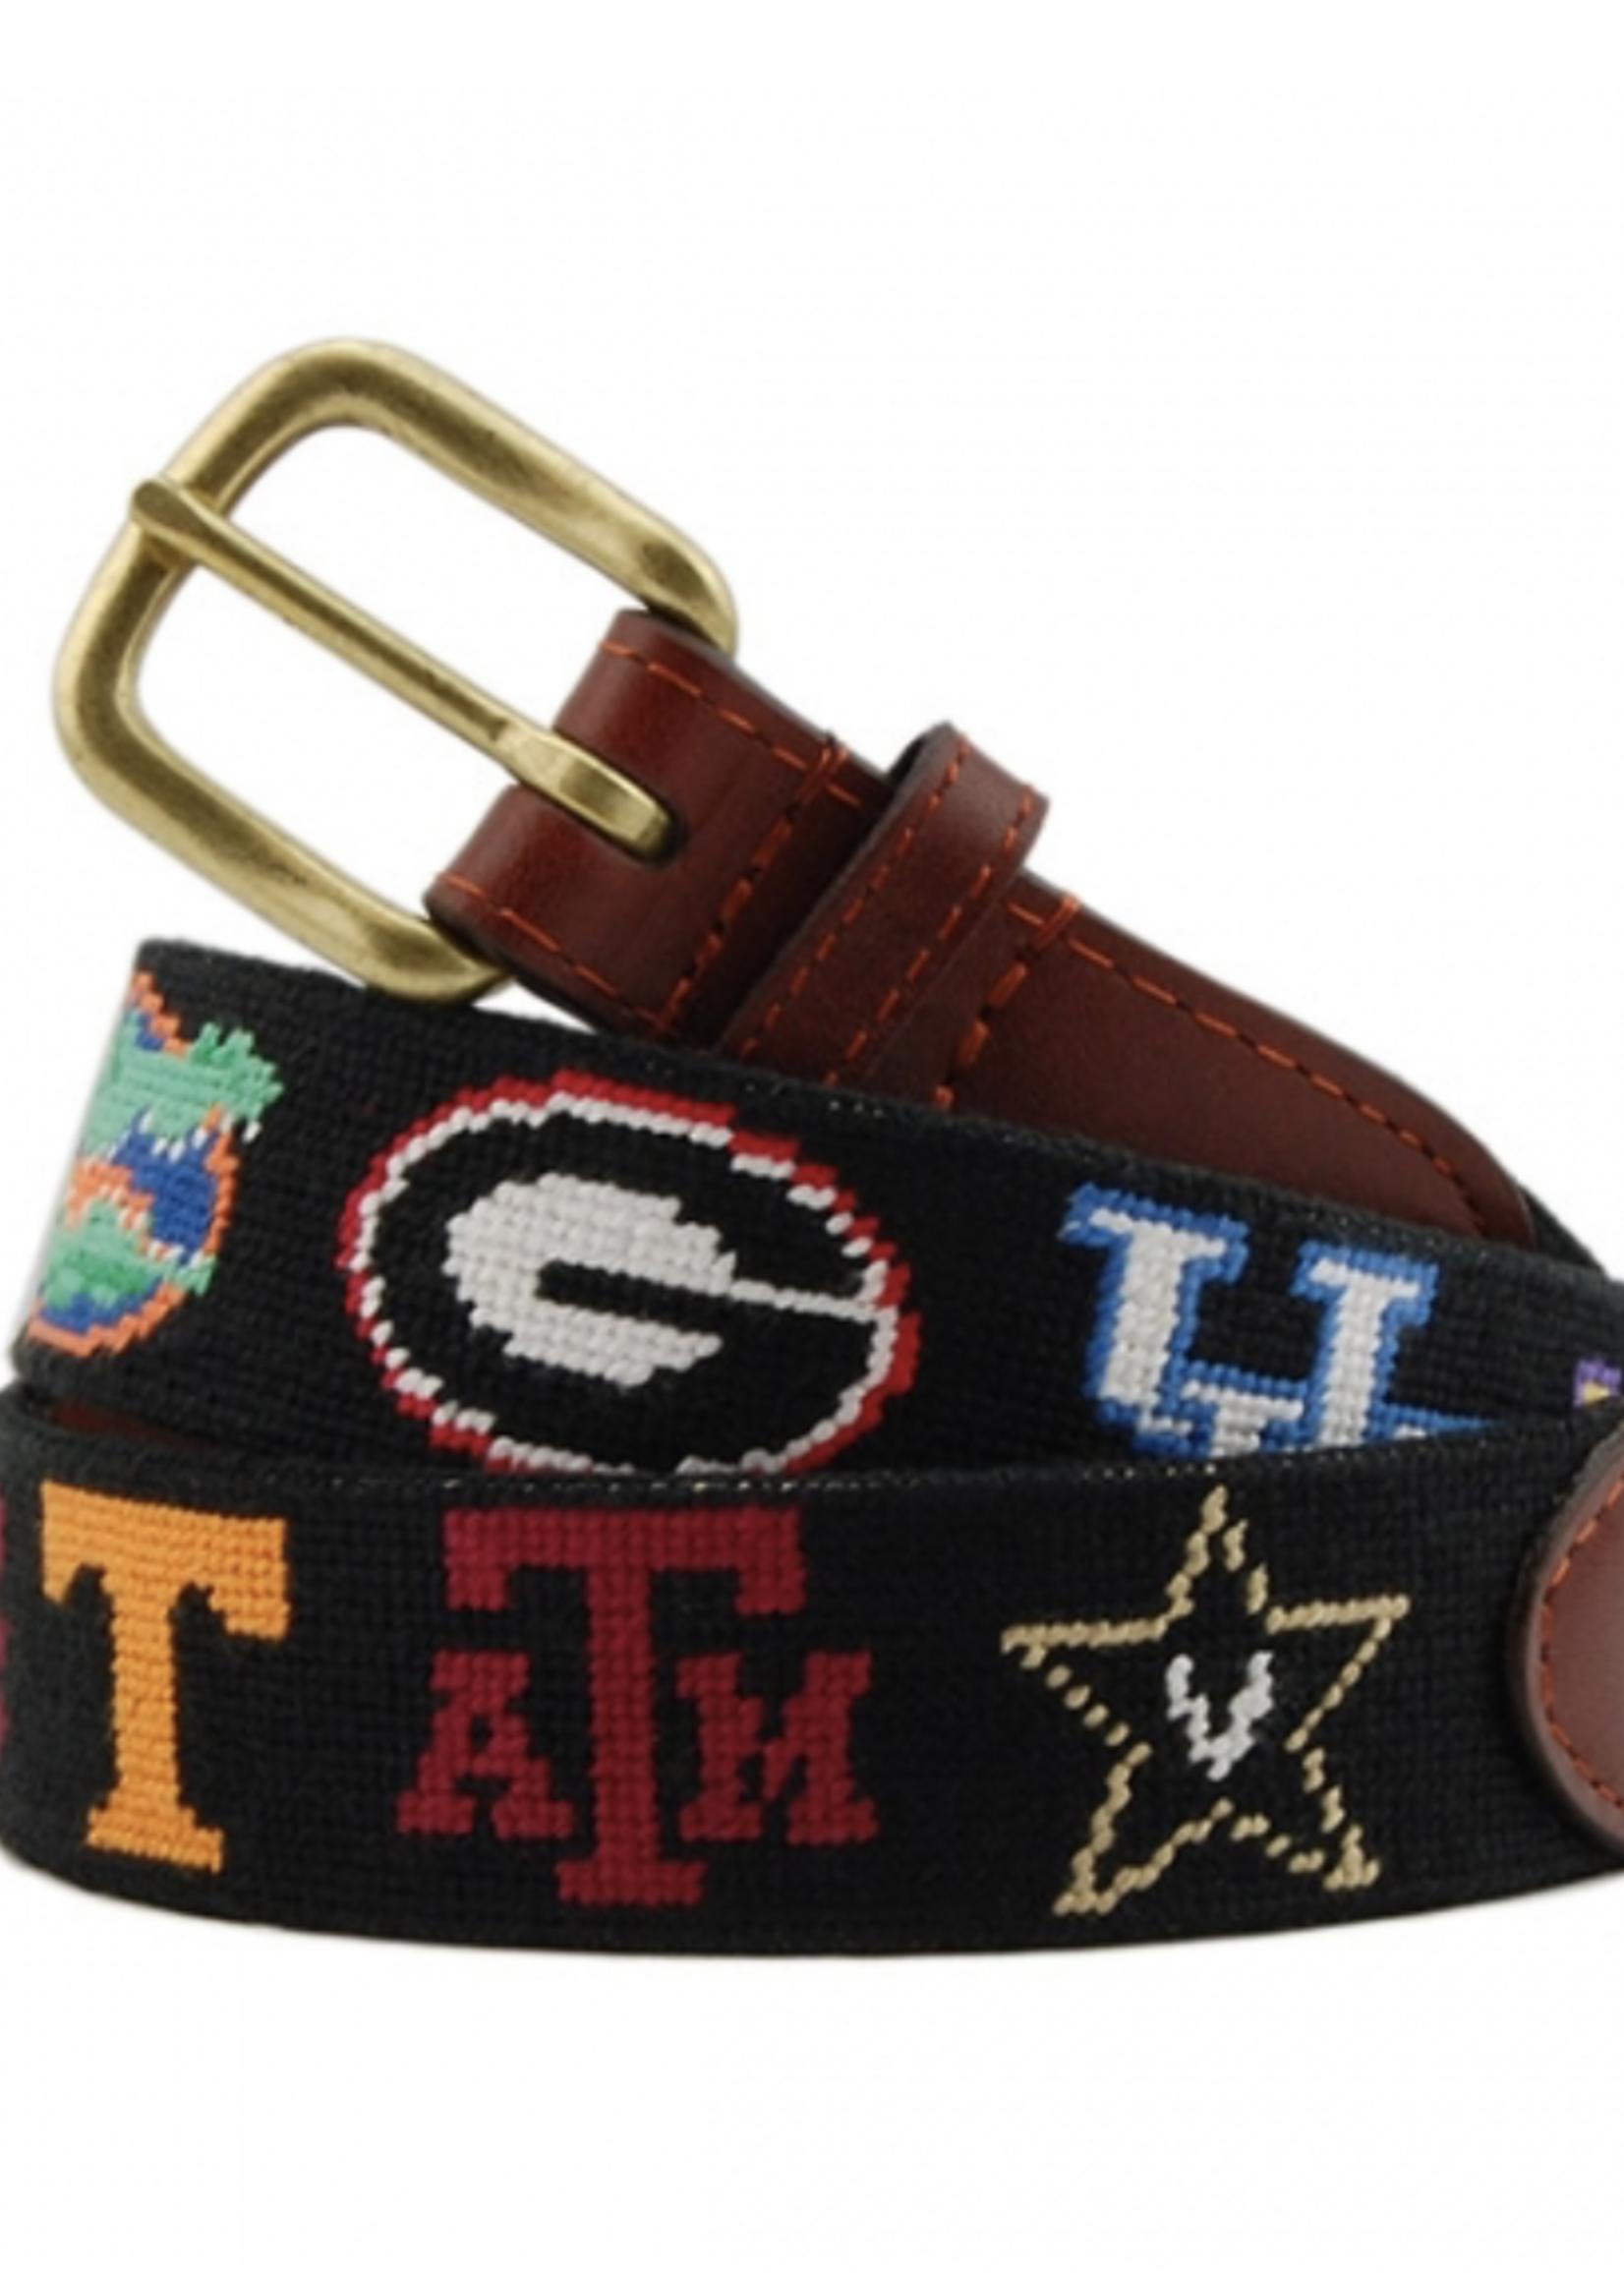 Smathers & Branson SEC Belt